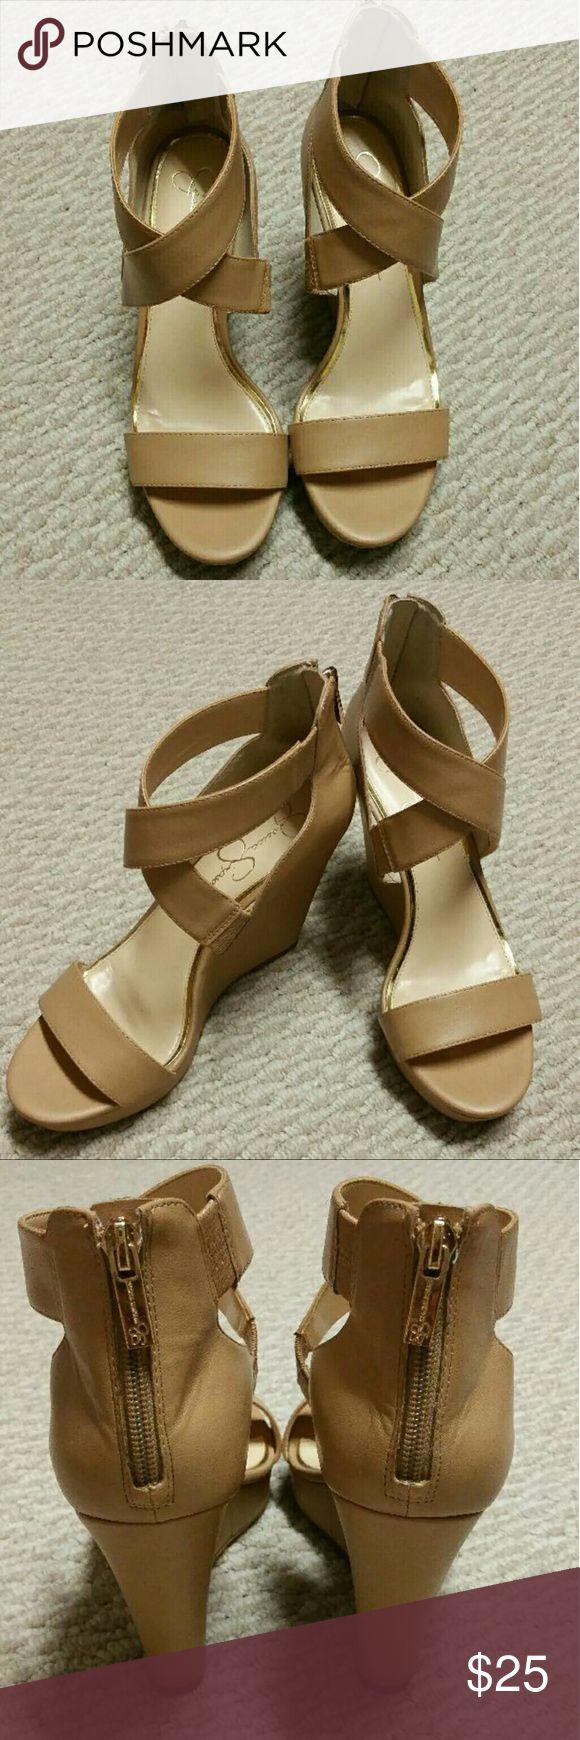 Jessica Simpson Beige Wedges Like new Jessica Simpson Beige Wedges Shoes Wedges